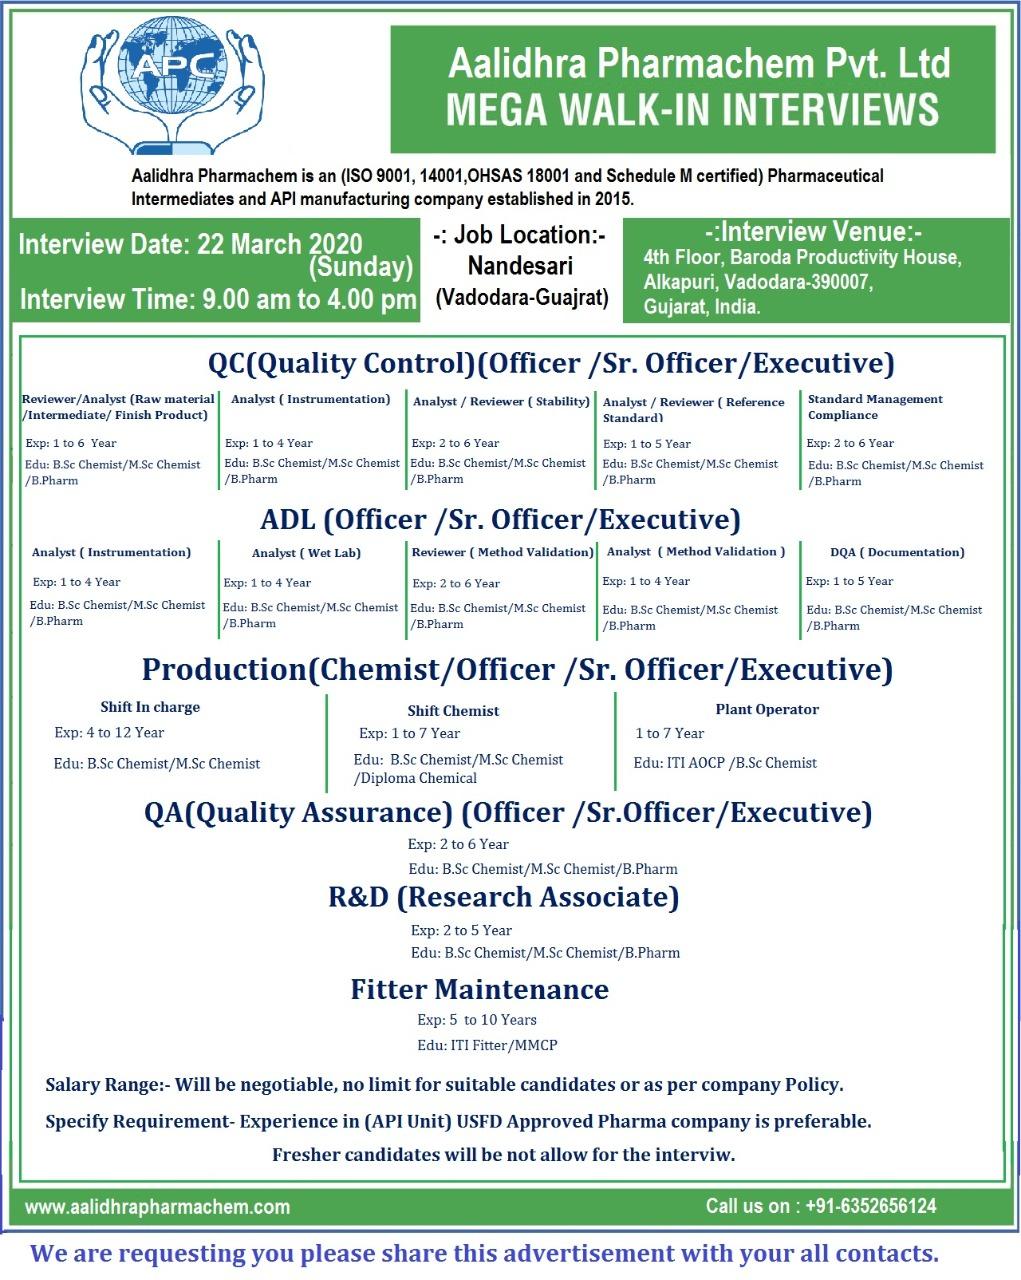 Aalidhra Pharmachem Pvt. Ltd - Mega Walk-In Interviews for Multiple Positions - QC | ADL | Production | QA | R&D | Maintenance on 22nd Mar' 2020